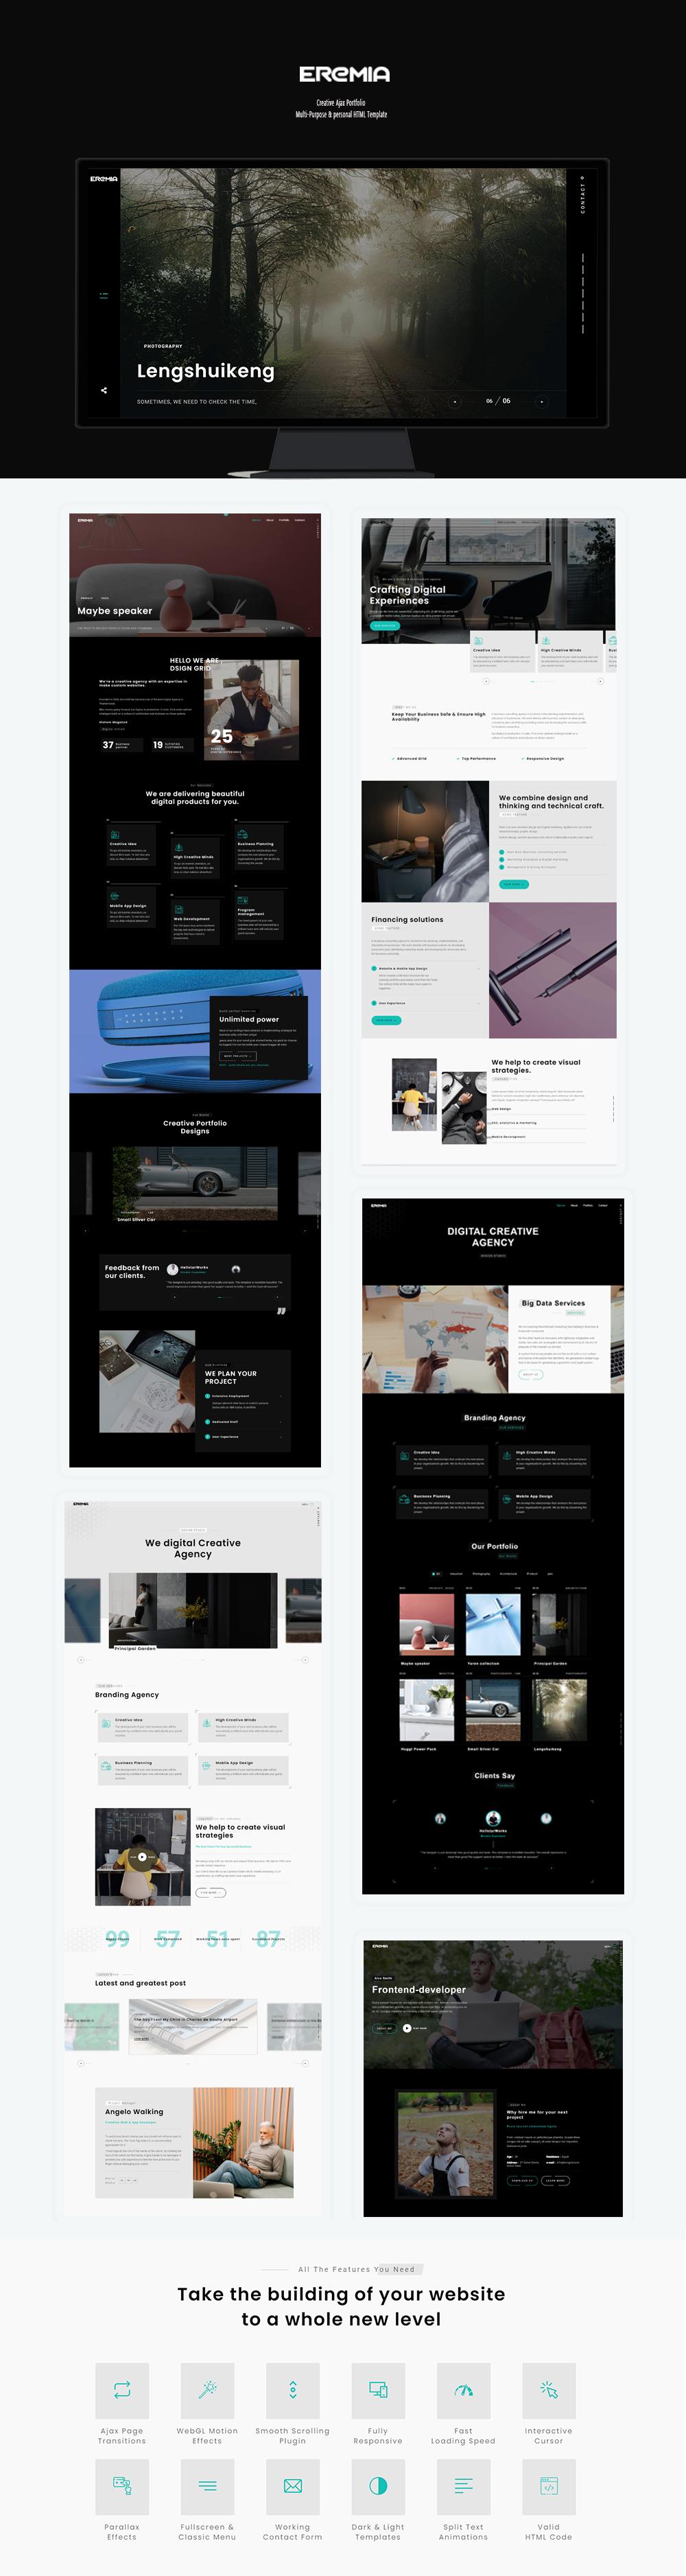 Eremia - Creative Ajax Portfolio Multi-Purpose & personal HTML Template - 1